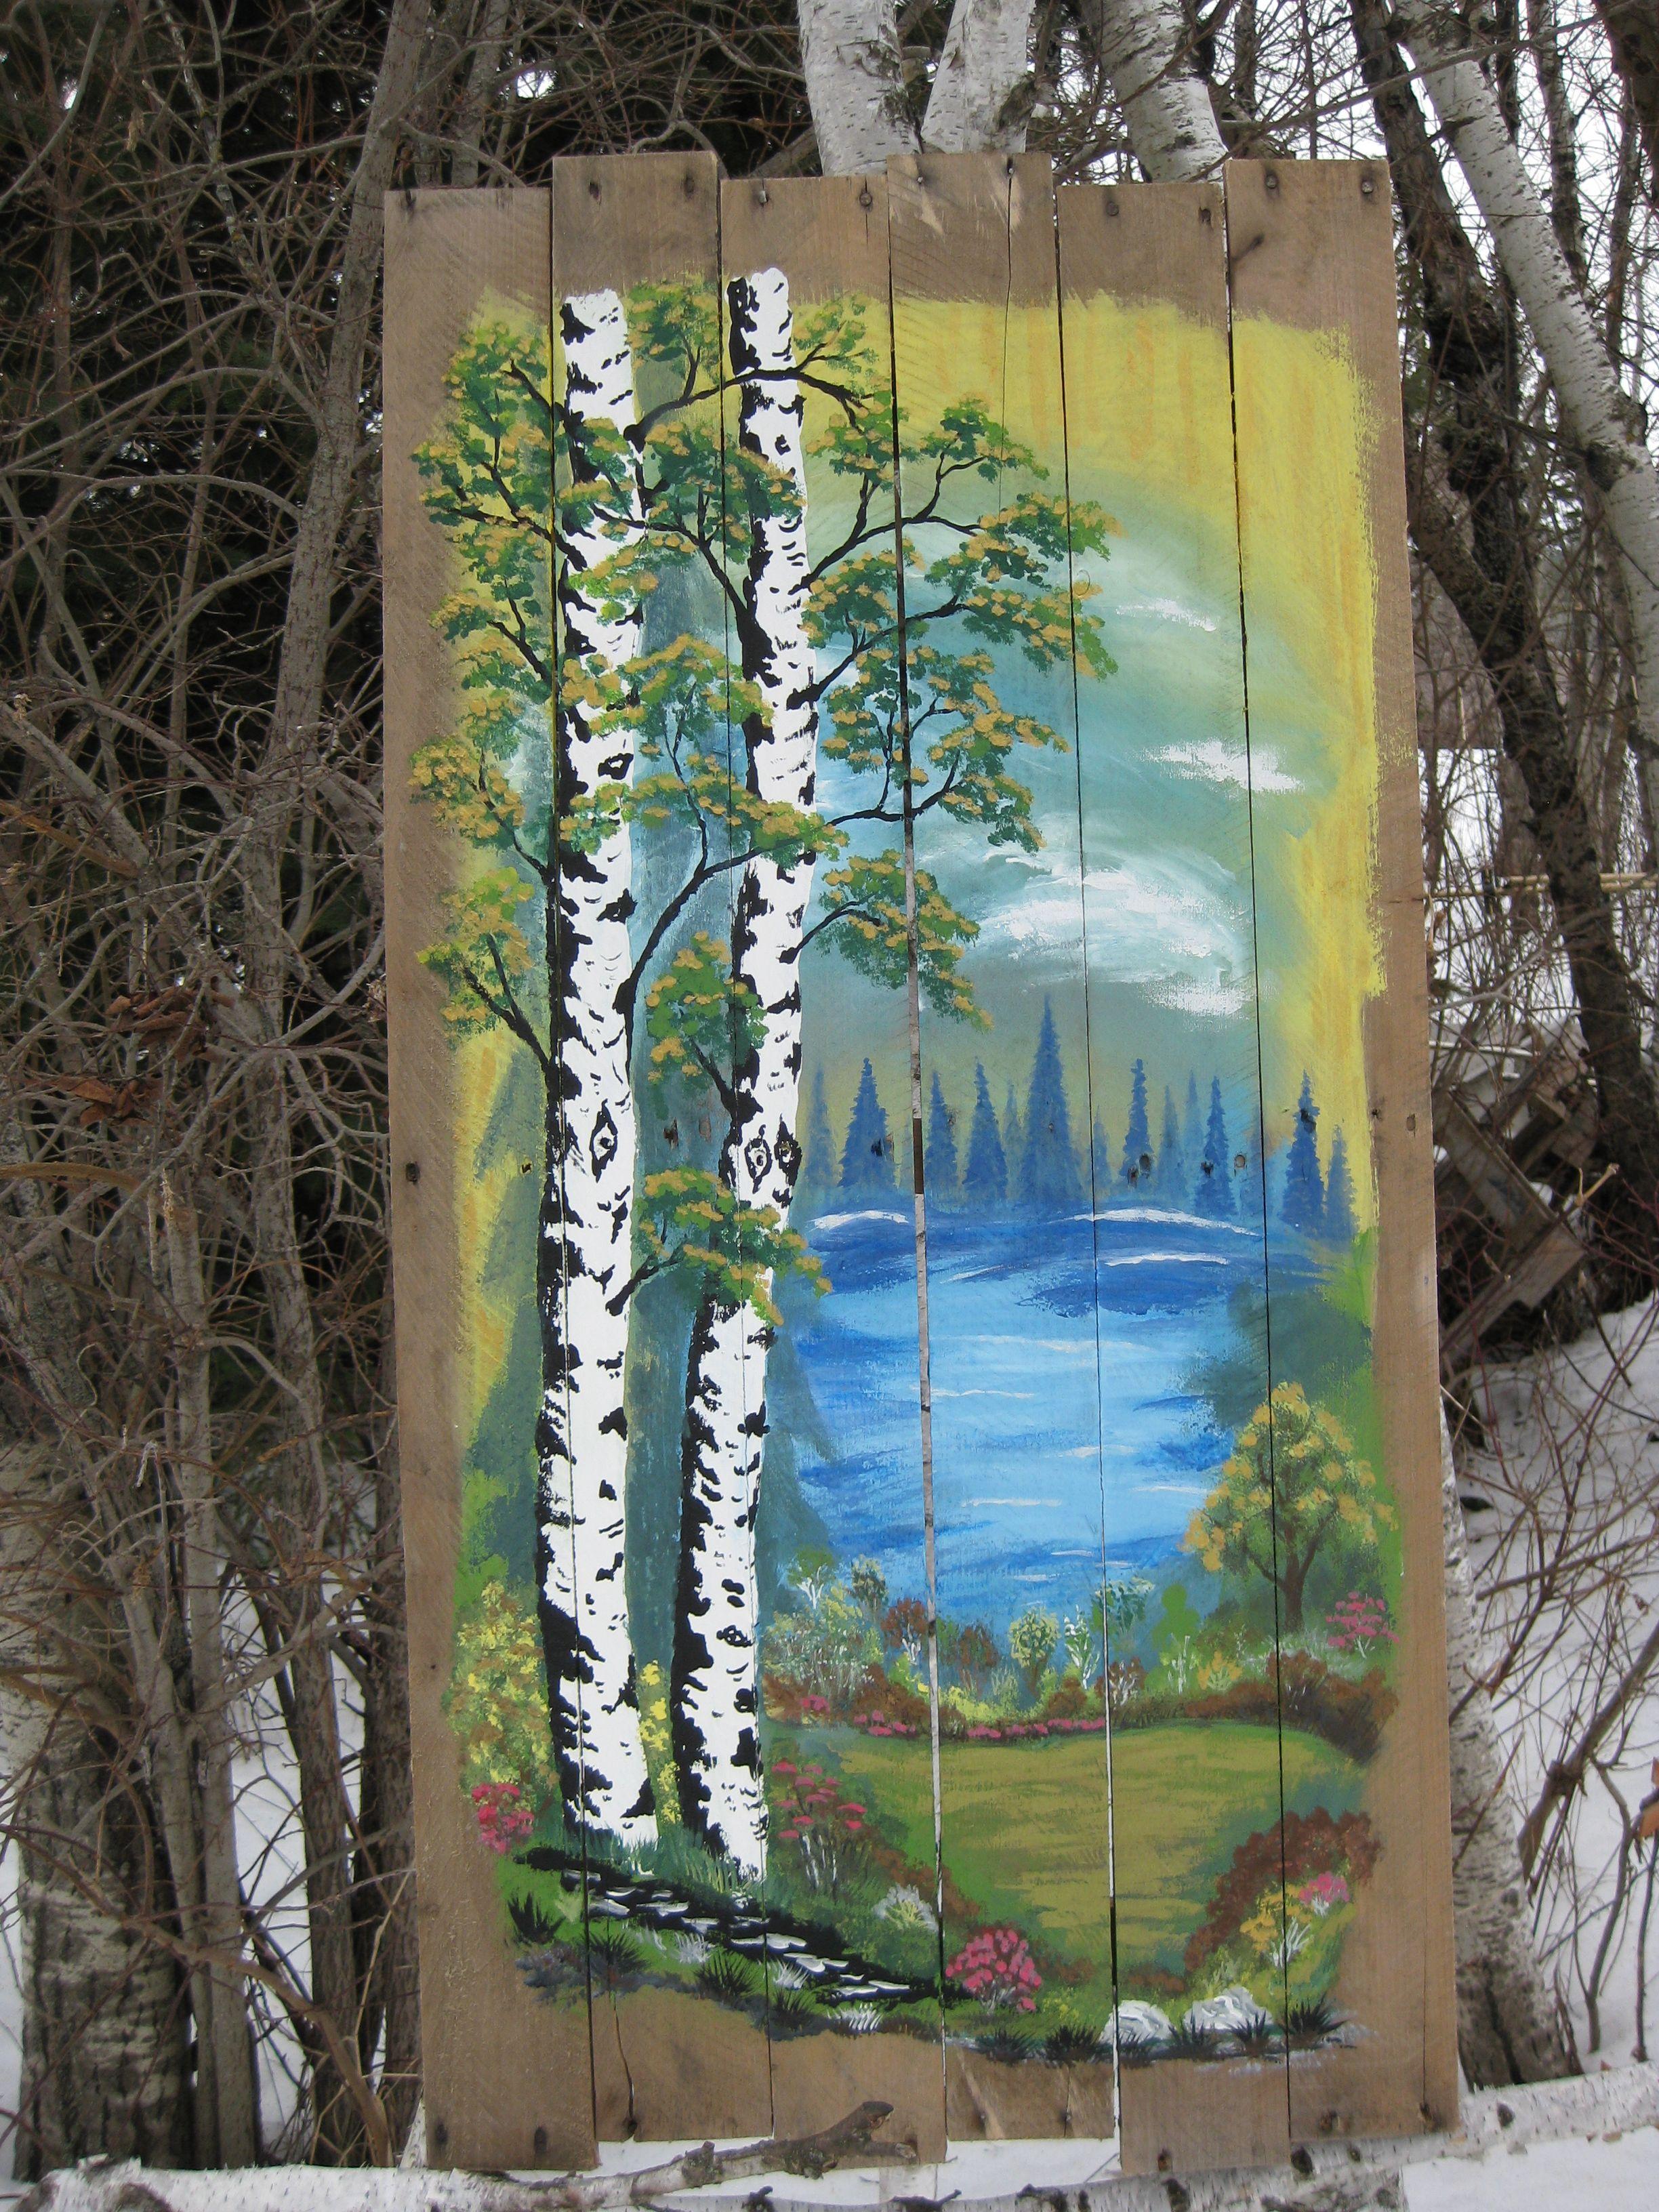 Pallet Painting Feb/17 painted by : Dennis Rawluk | Pallet ...